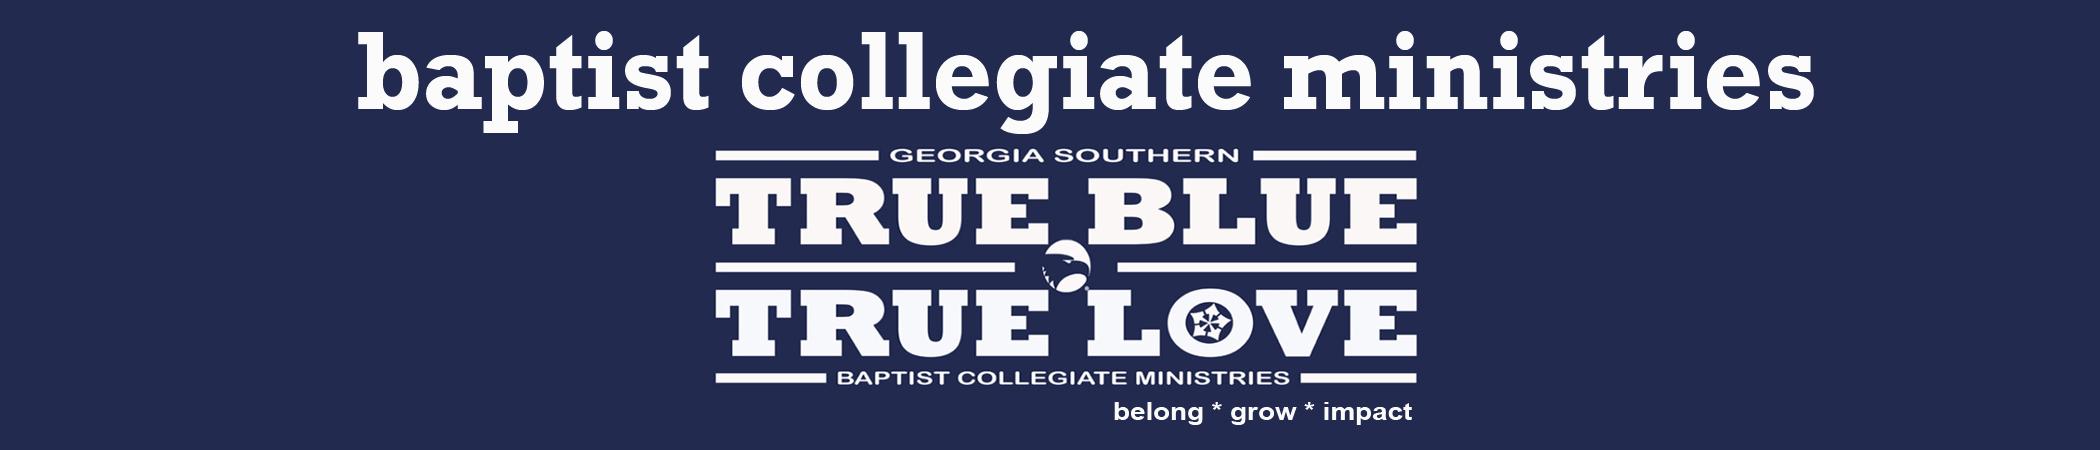 GeorgiaSouthernBCM | Baptist Collegiate Ministries